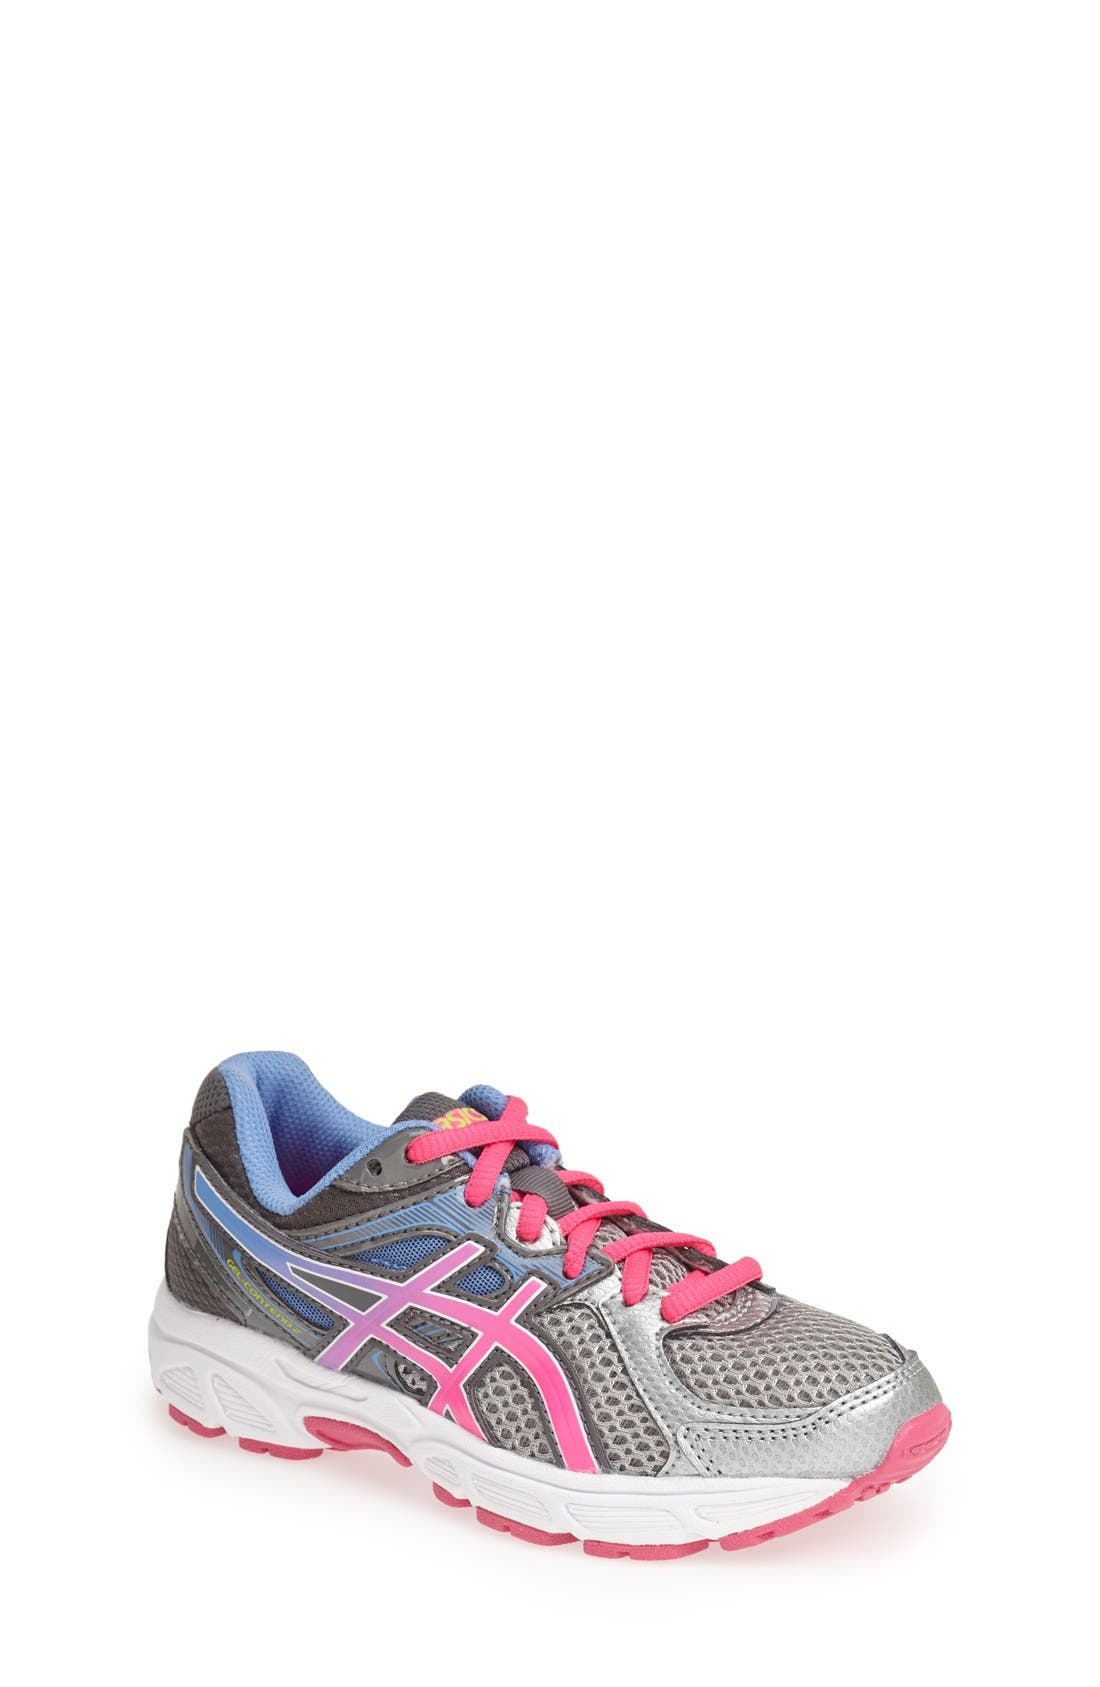 'GEL-Contend 2' Running Shoe,                             Main thumbnail 1, color,                             020